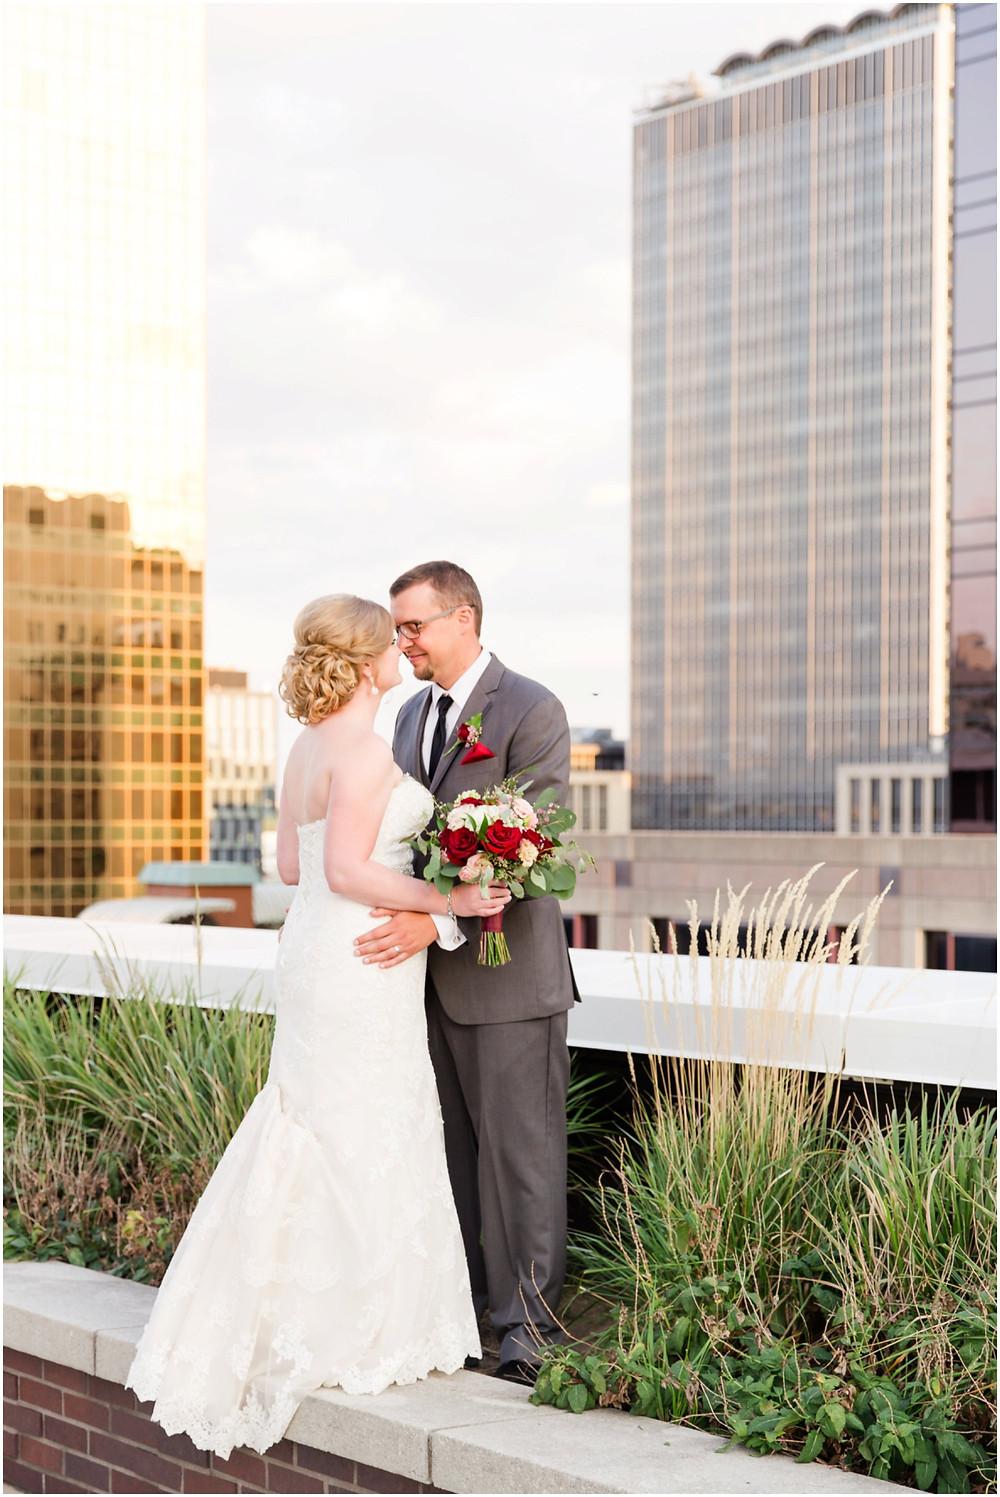 Indy wedding photography